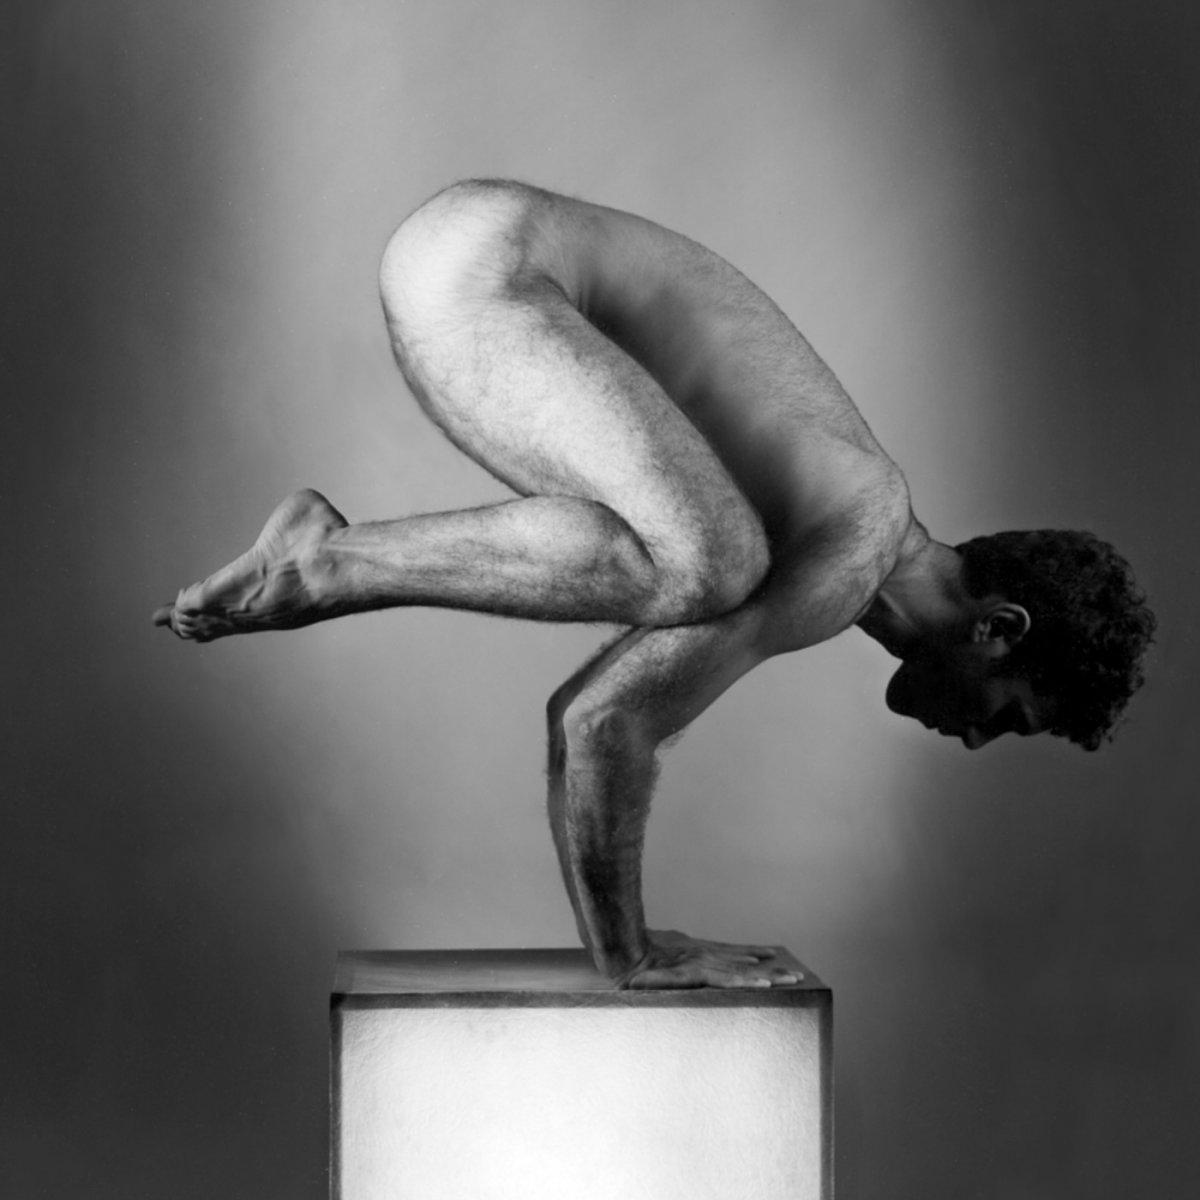 fotograf buxtehude deutschland jan sauerwein   pixolum